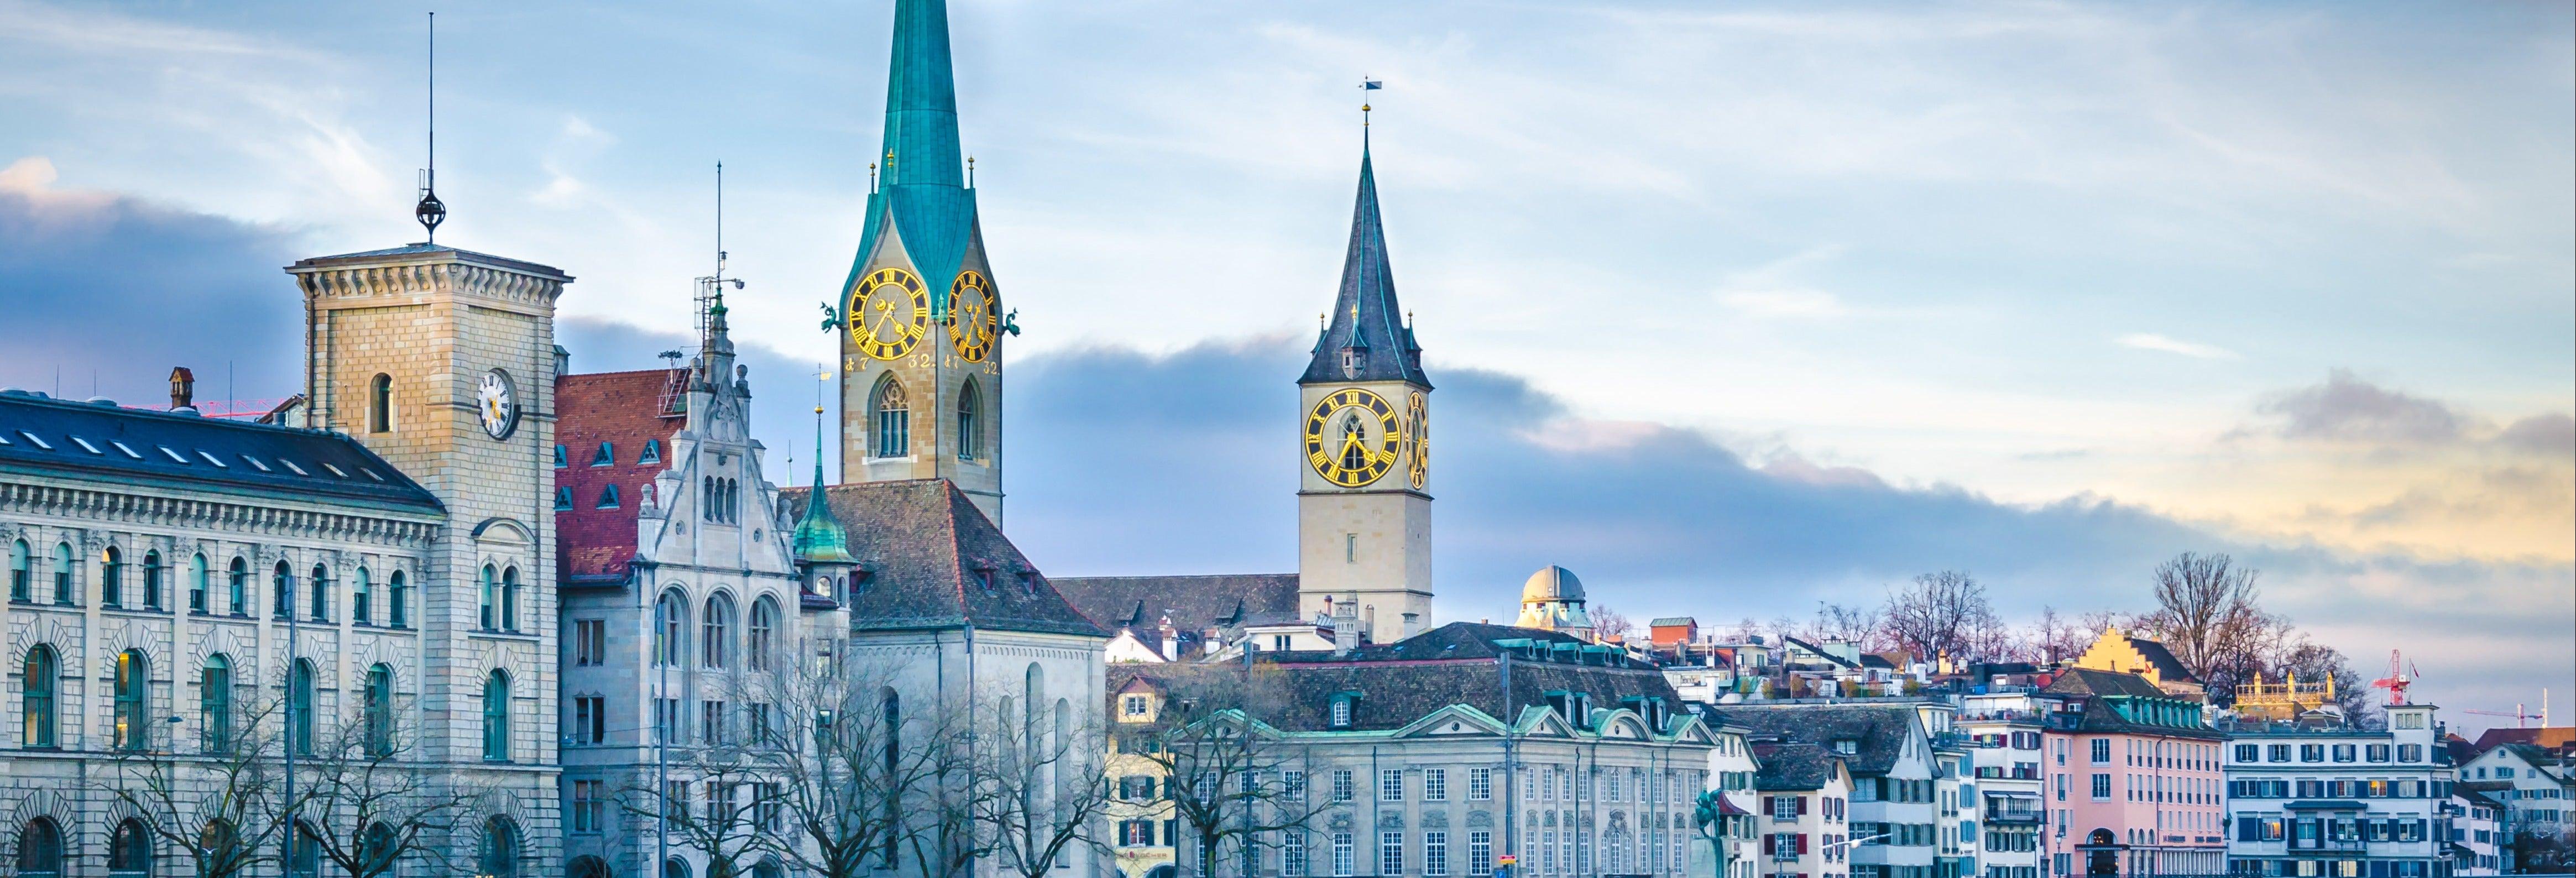 Tour completo di Zurigo